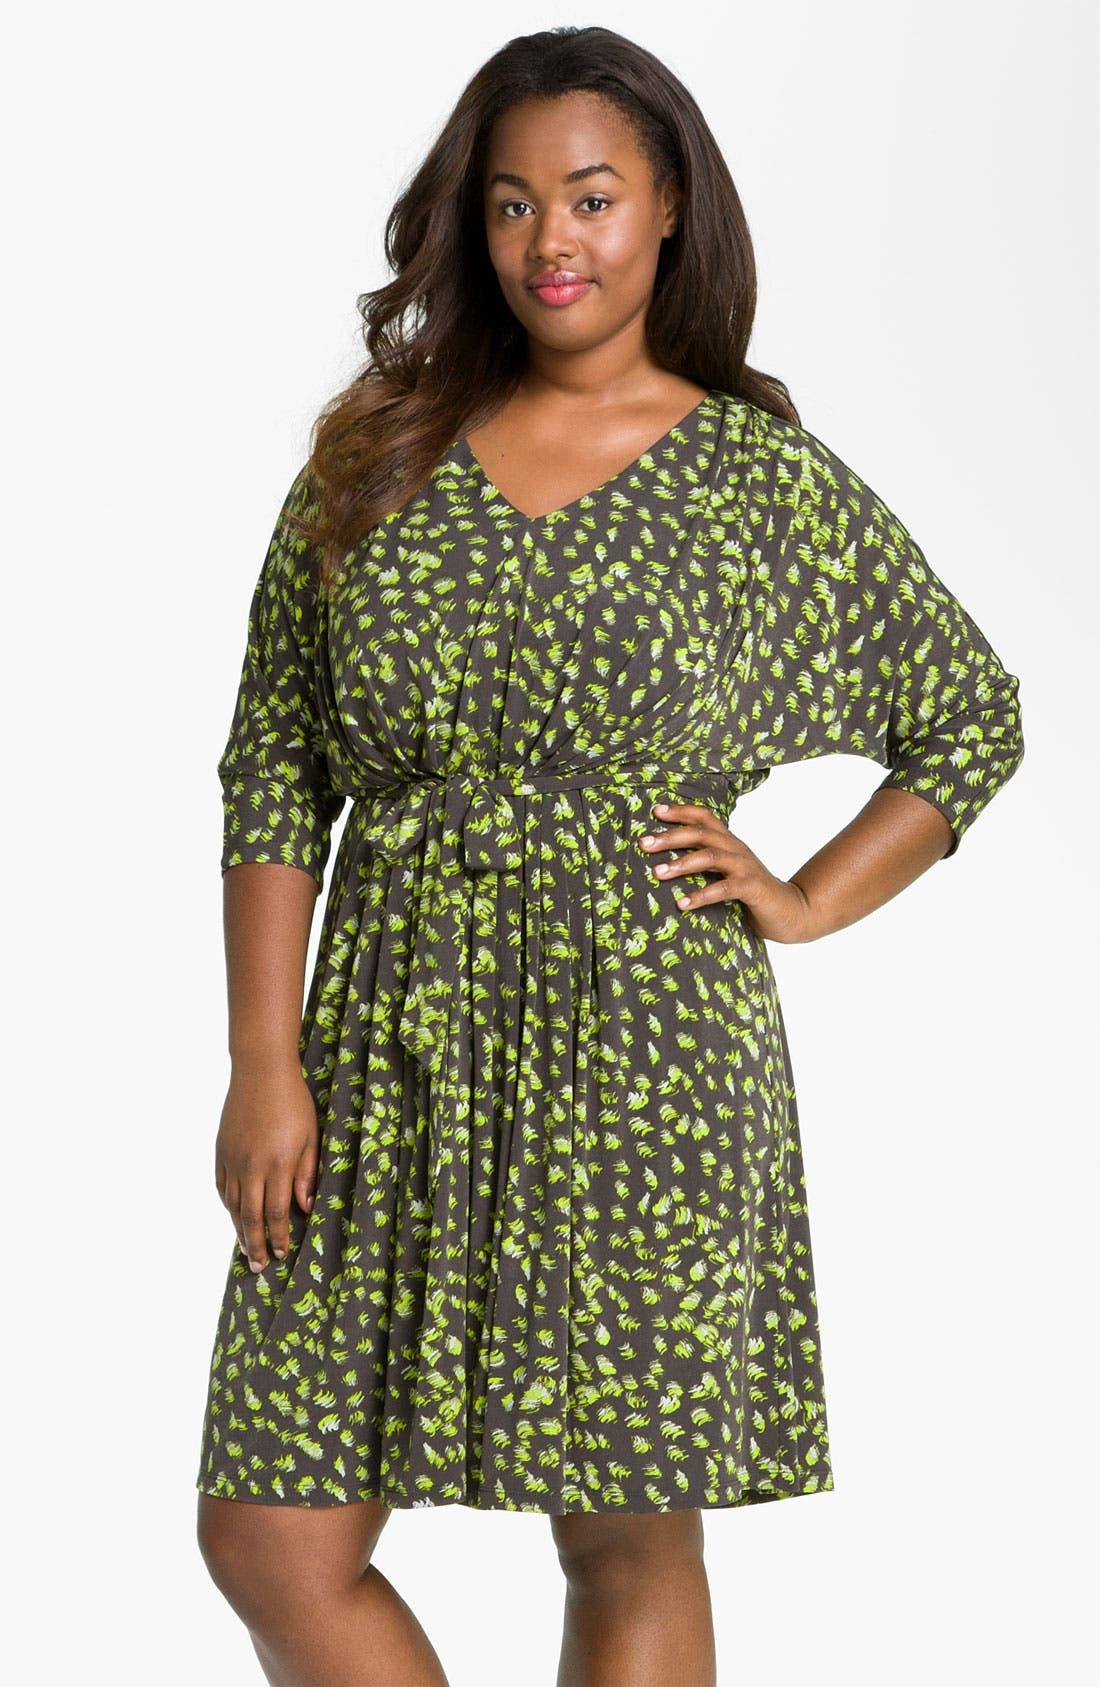 Main Image - Suzi Chin for Maggy Boutique Tie Front Print Dress (Plus)